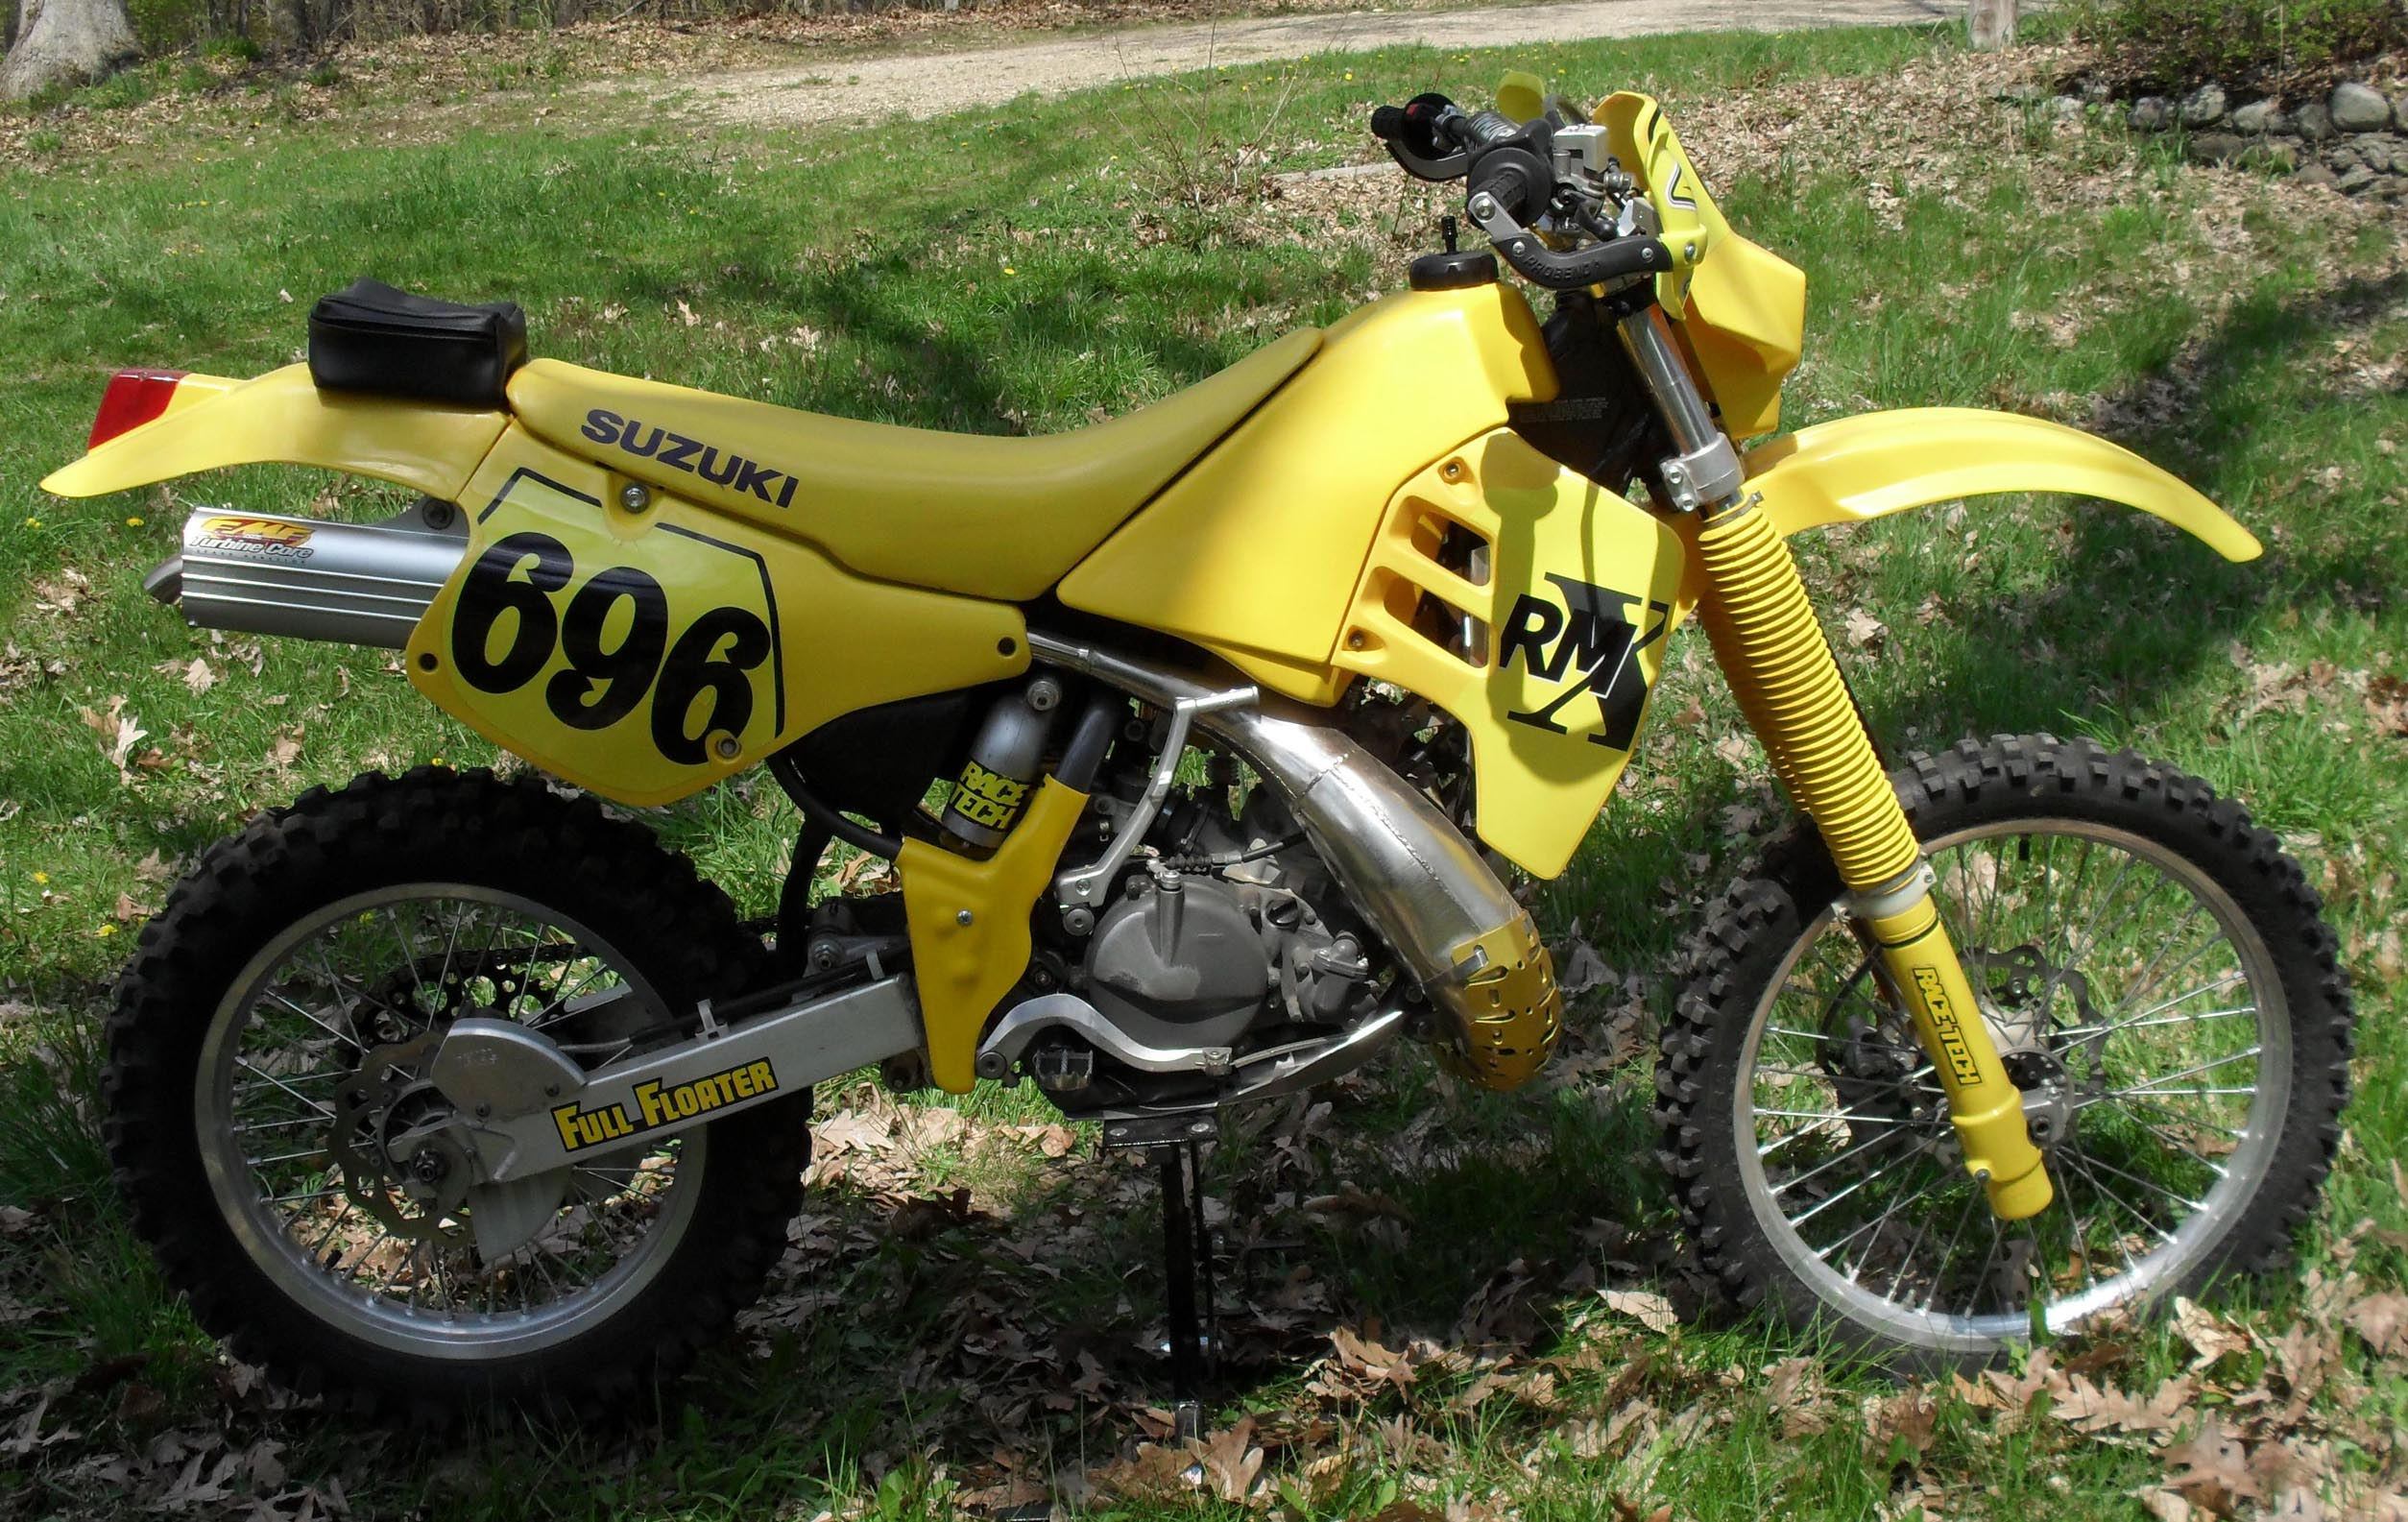 1996 suzuki rmx250 rmx 250 fullfloater com restoration